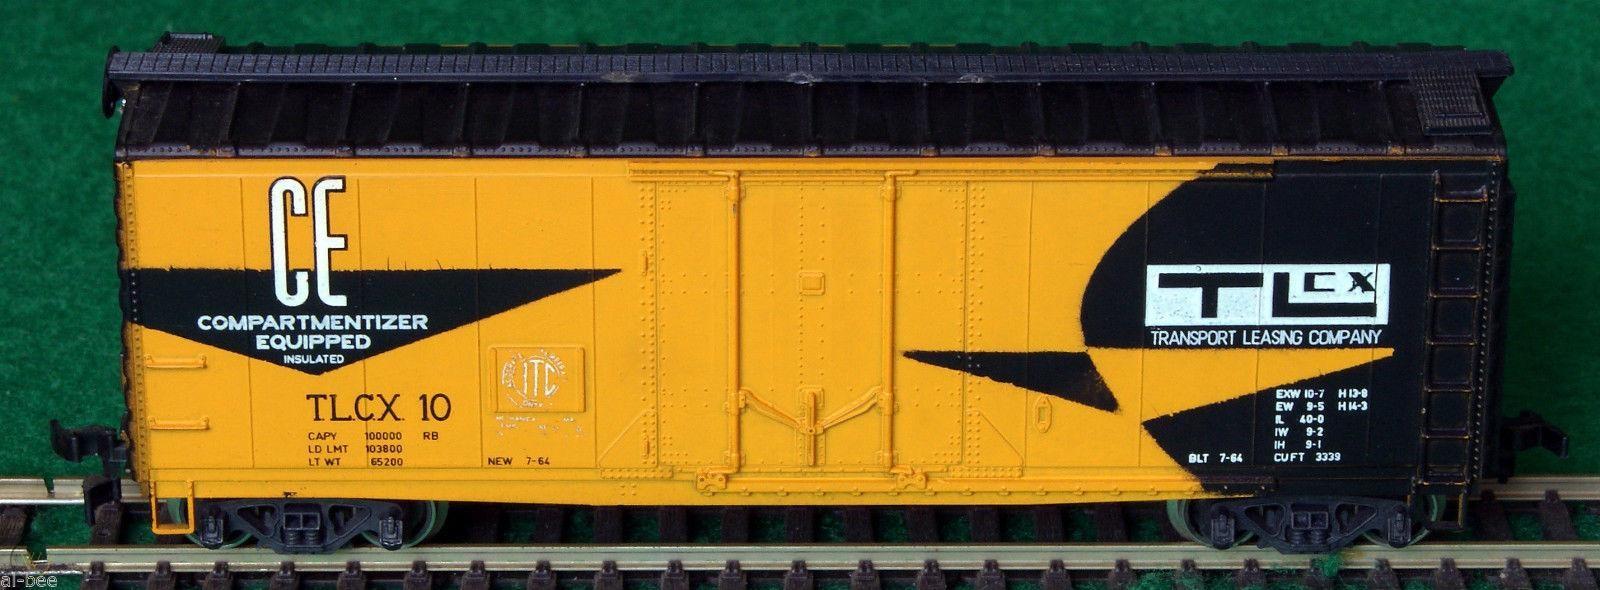 N Scale - AHM - 4454B - Reefer, 50 Foot, Mechanical - Transport Leasing Company - 10